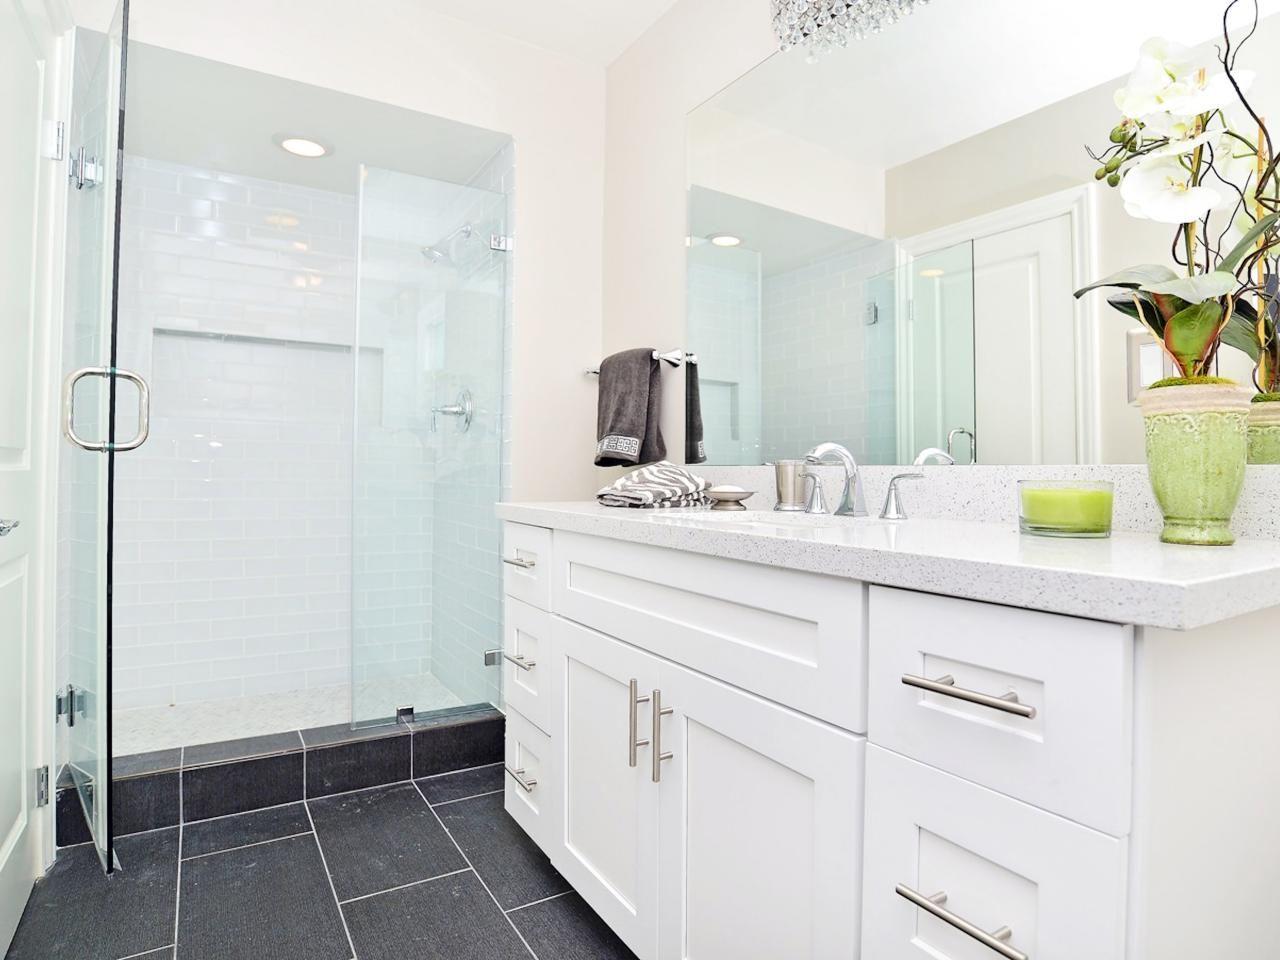 Bathroom Countertop Material Options | Bathroom makeovers, Luxurious ...